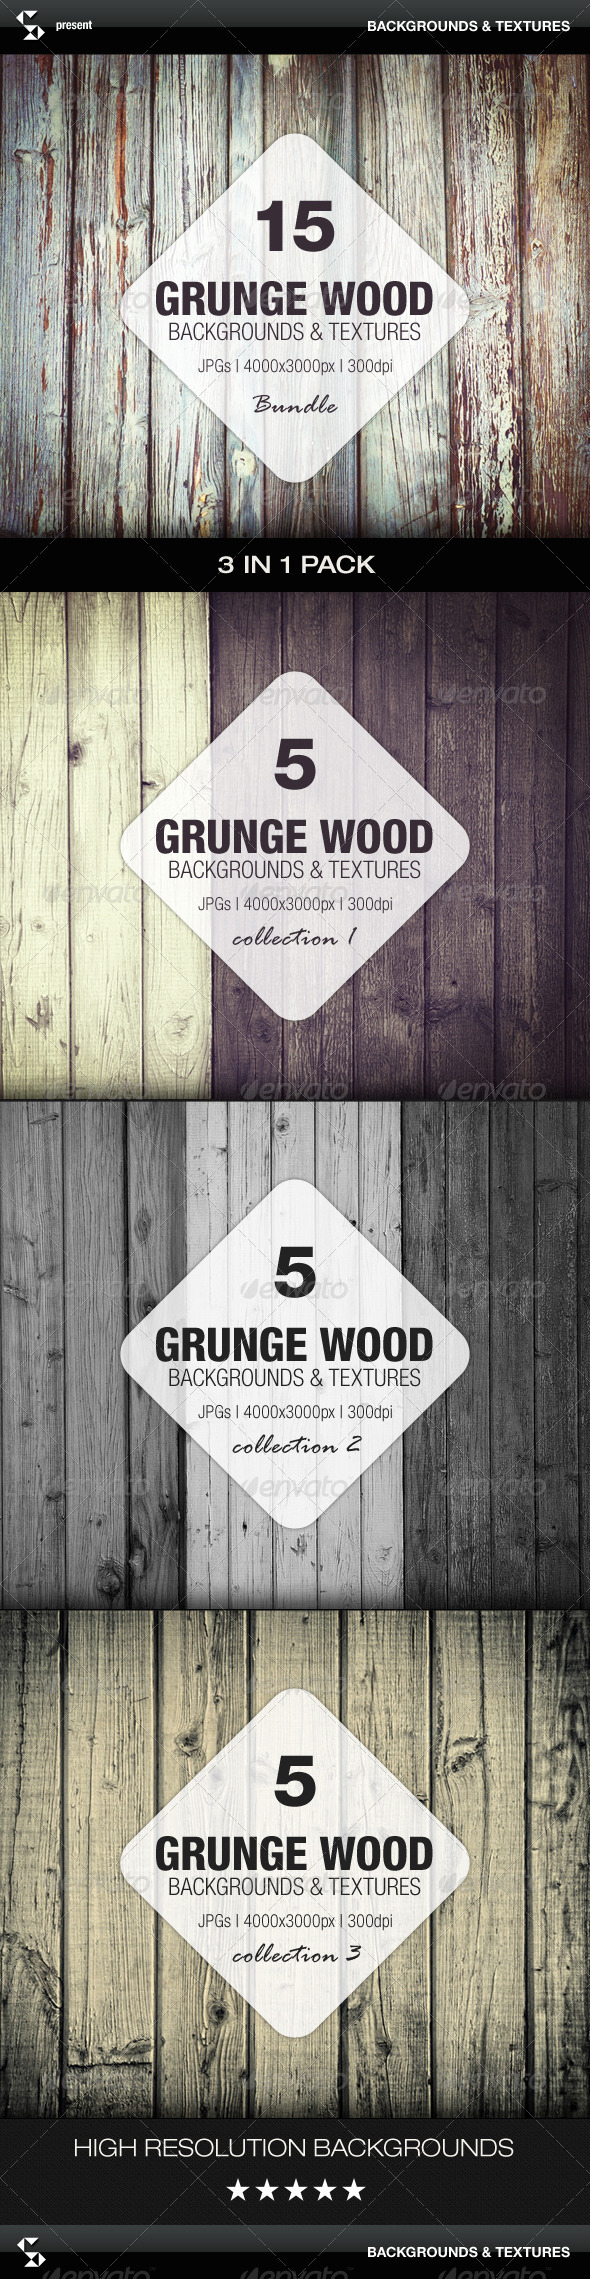 GraphicRiver Grunge Wood Backgrounds Bundle 7776711